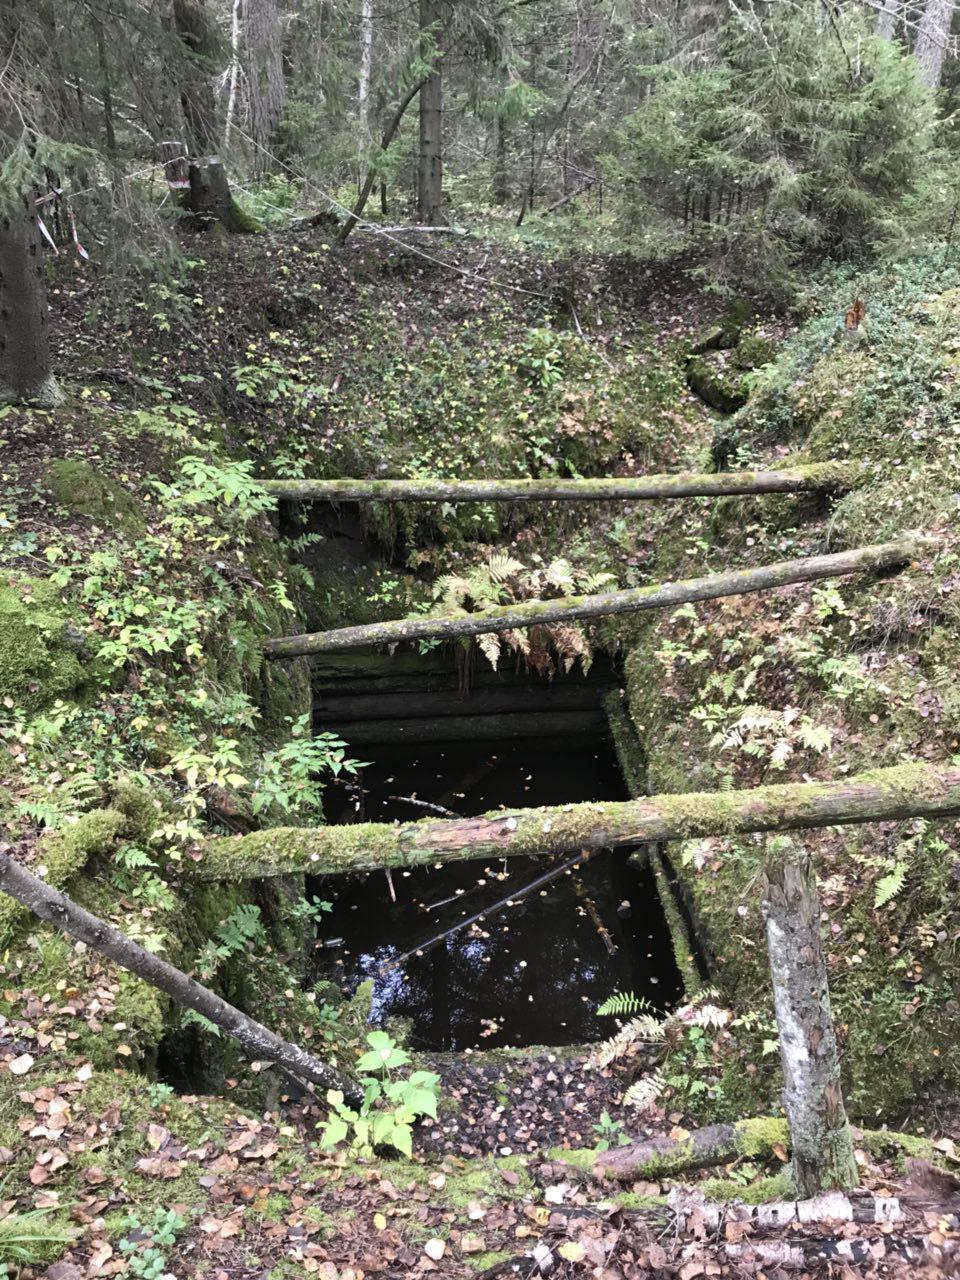 Шахта Герберц, Cave Diving Gerbertz